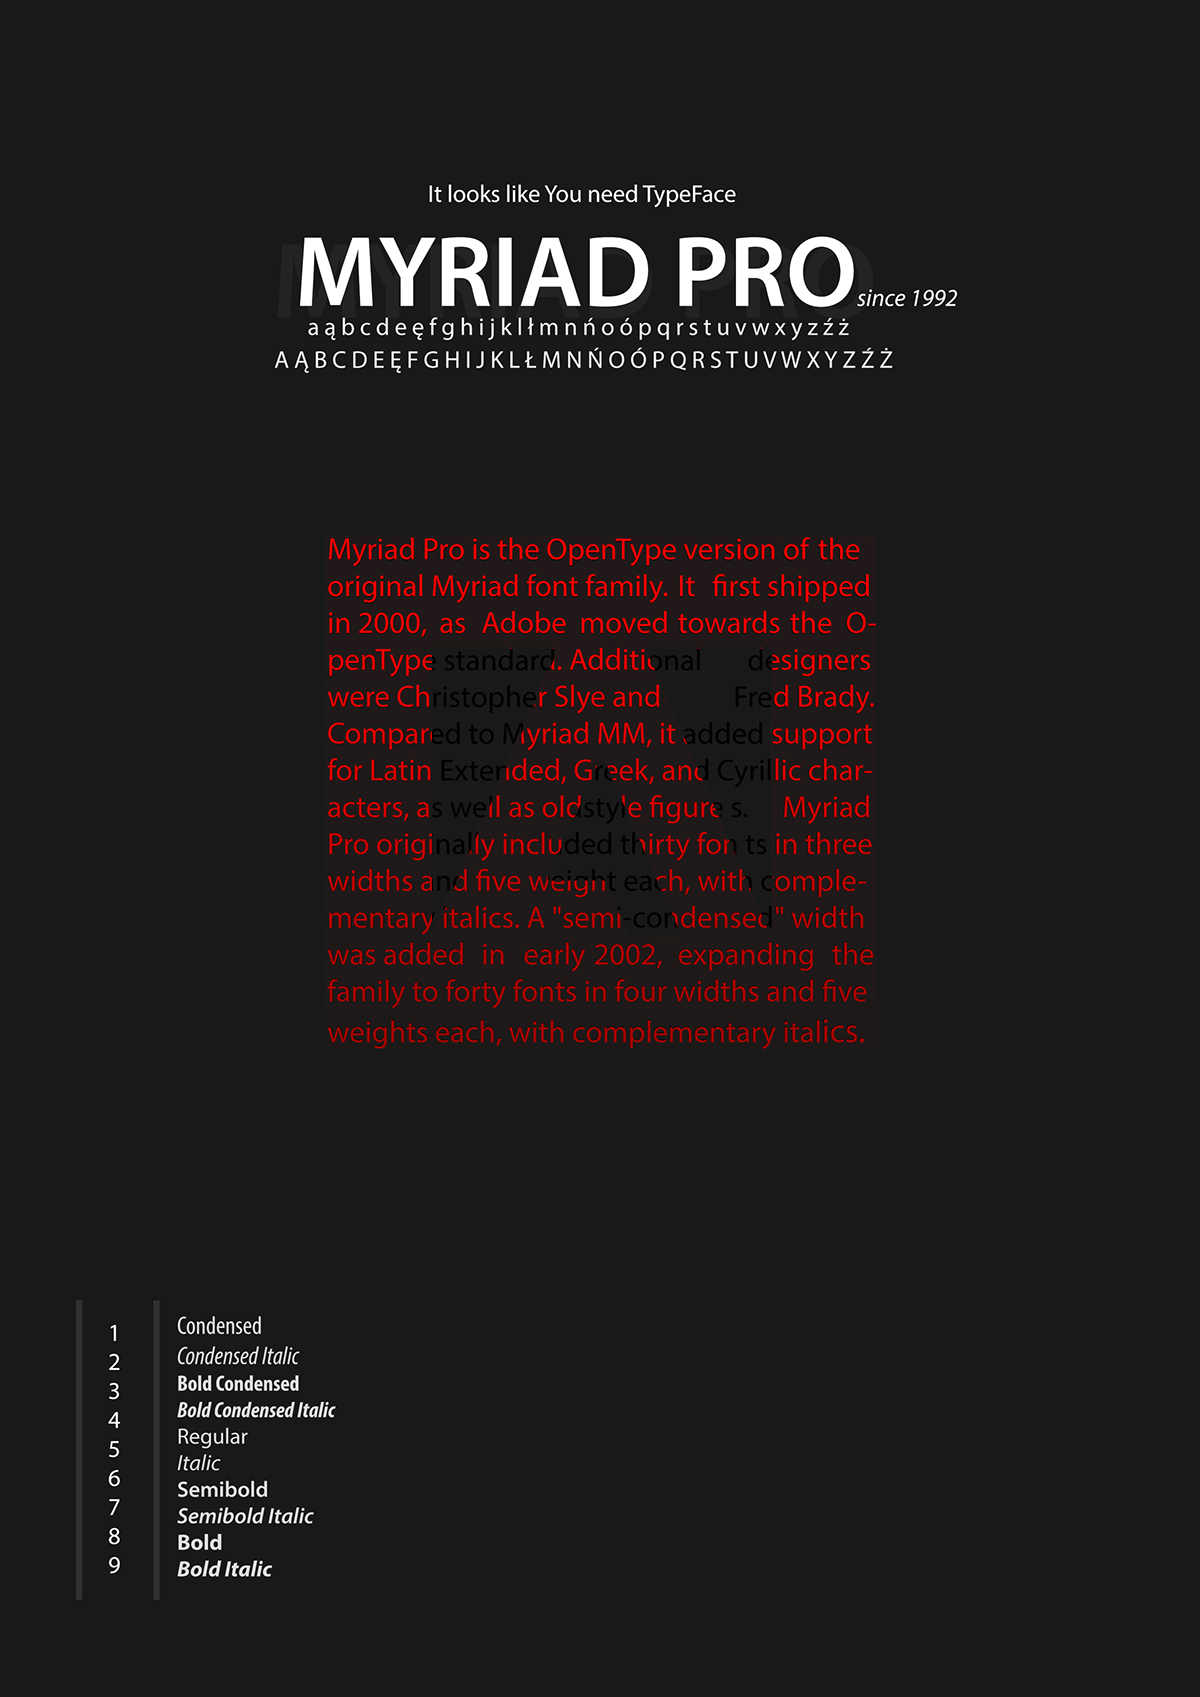 Myriad Pro posters | Gathiar Art on Behance